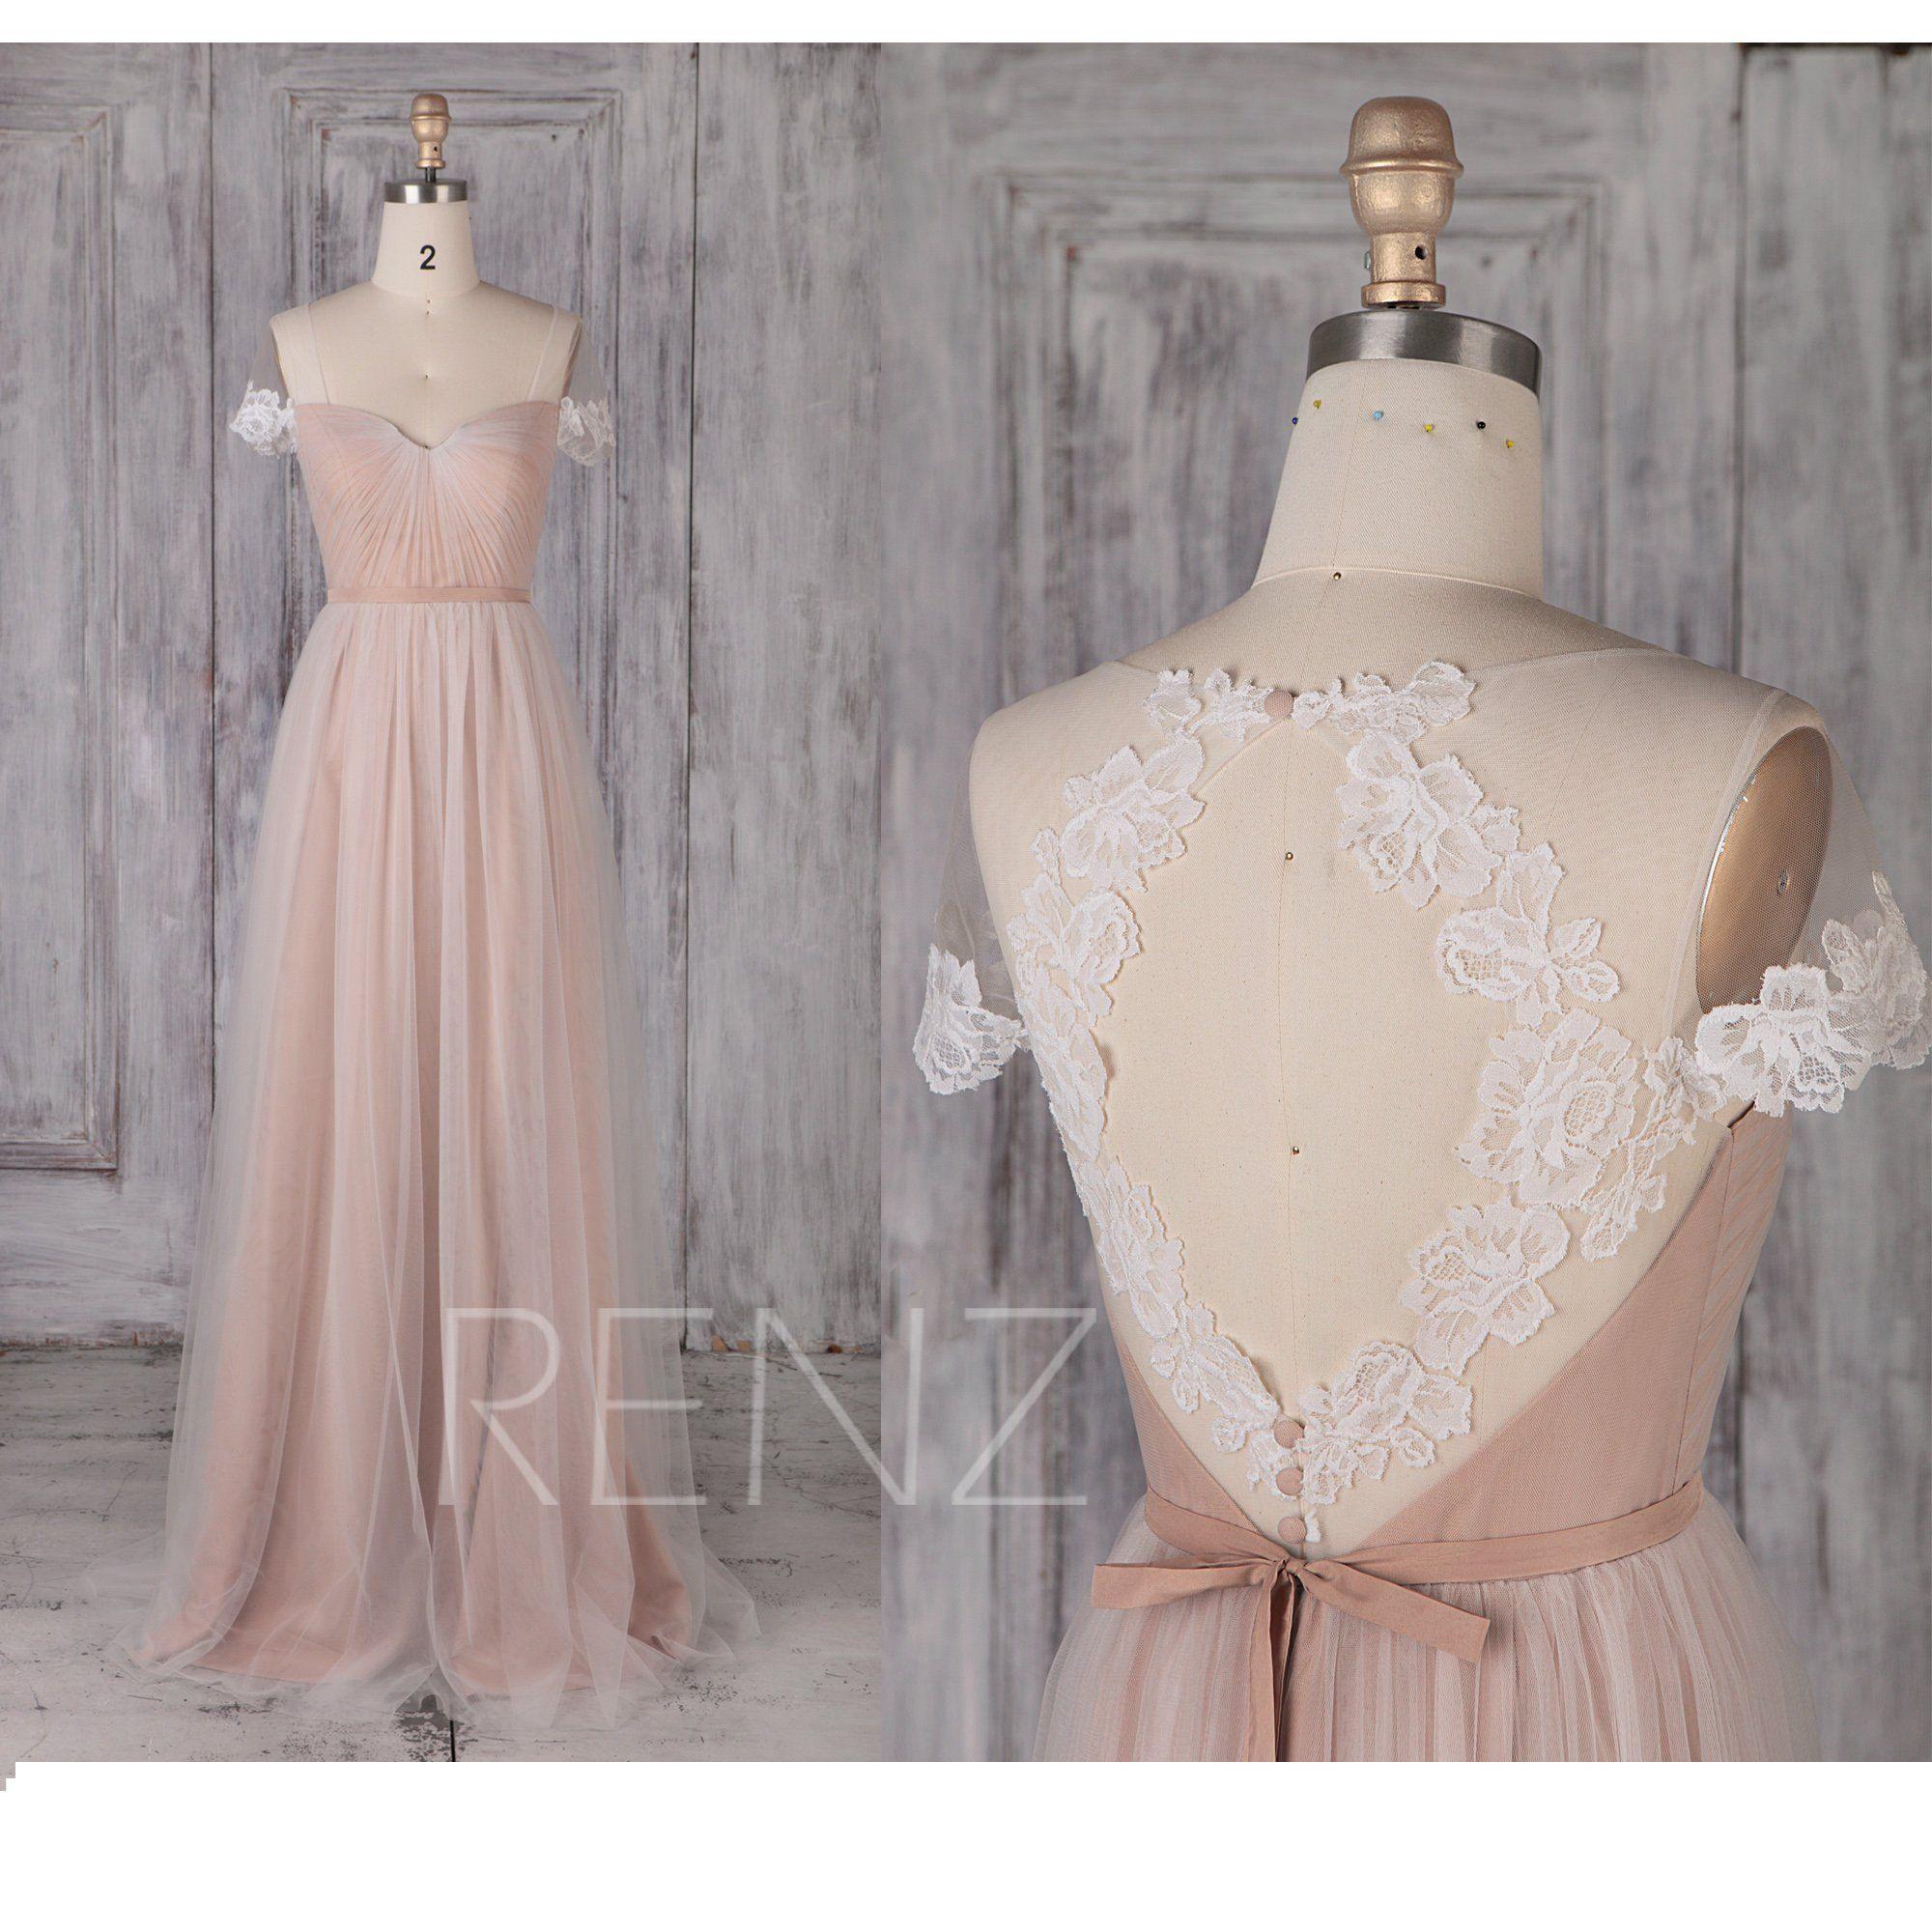 20 Top Abendkleid Ivory DesignAbend Großartig Abendkleid Ivory Design